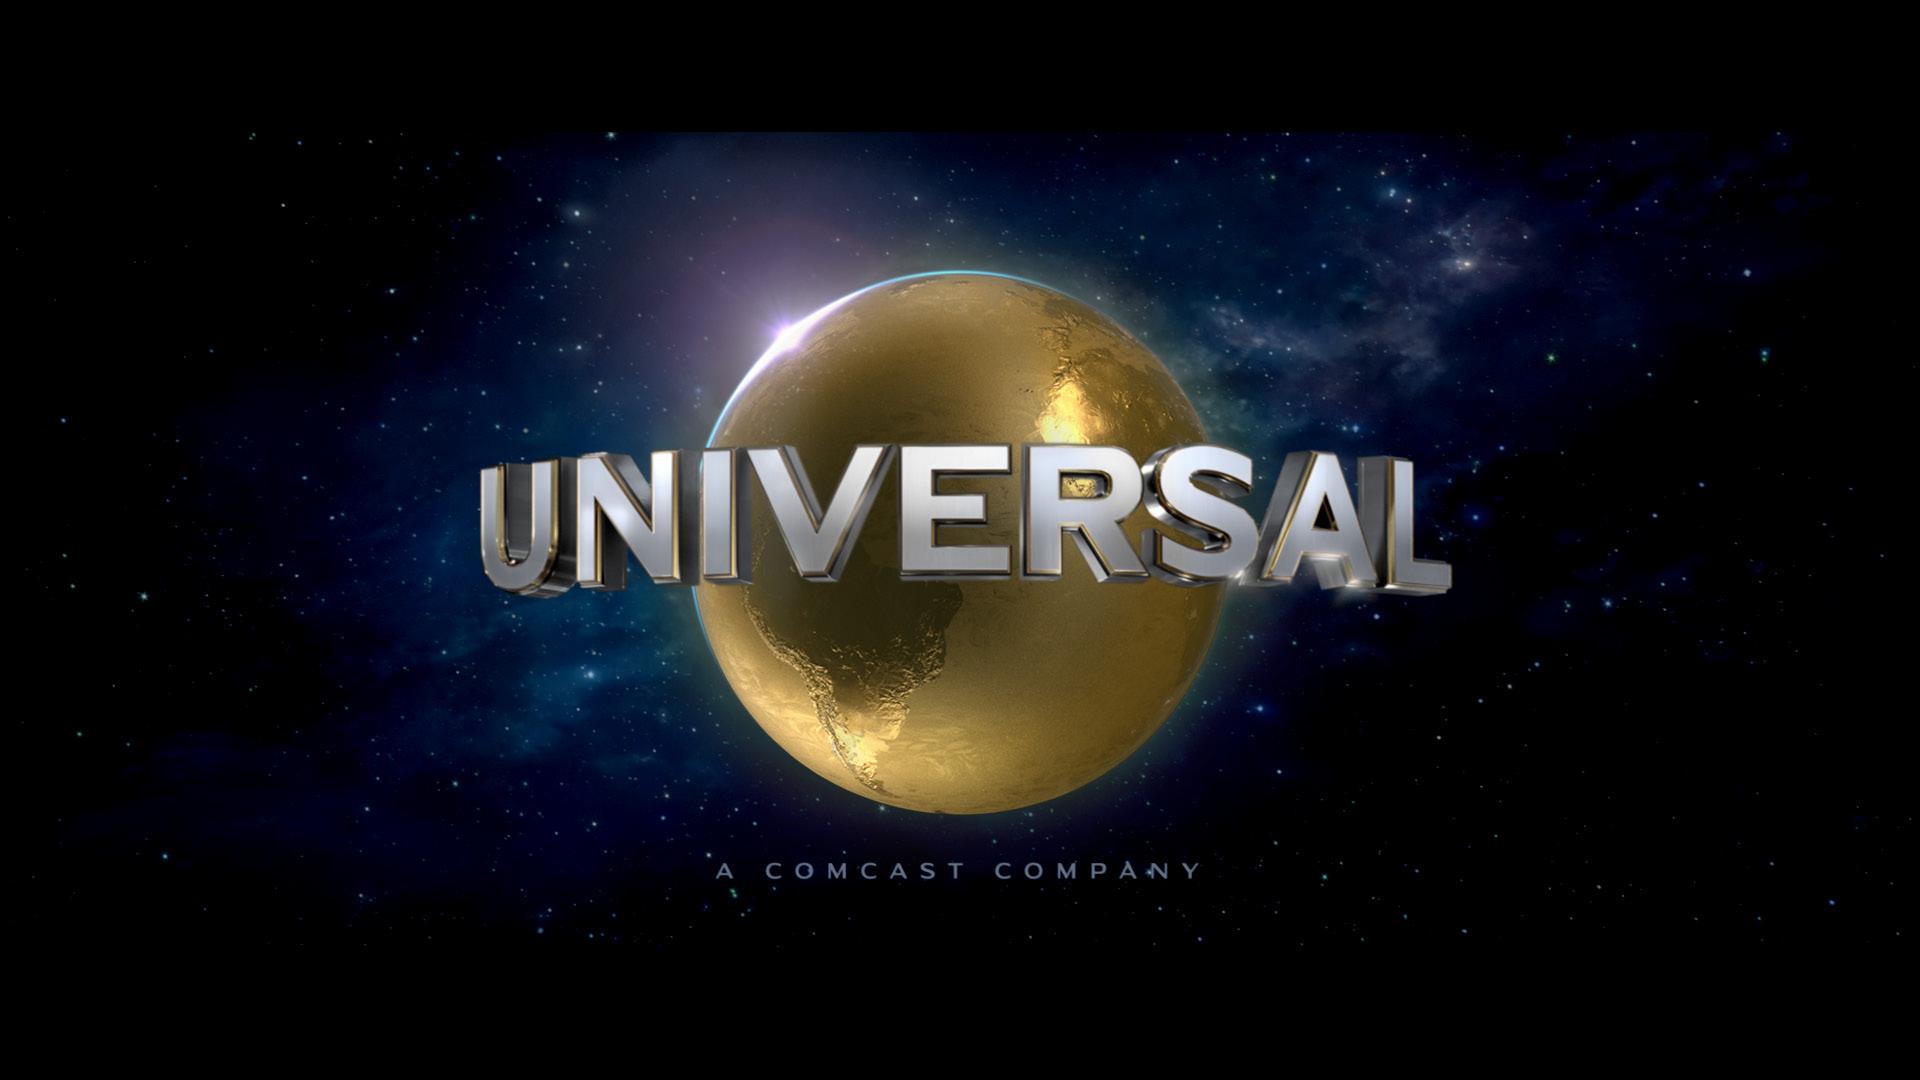 UniversalTitles_f006.jpg